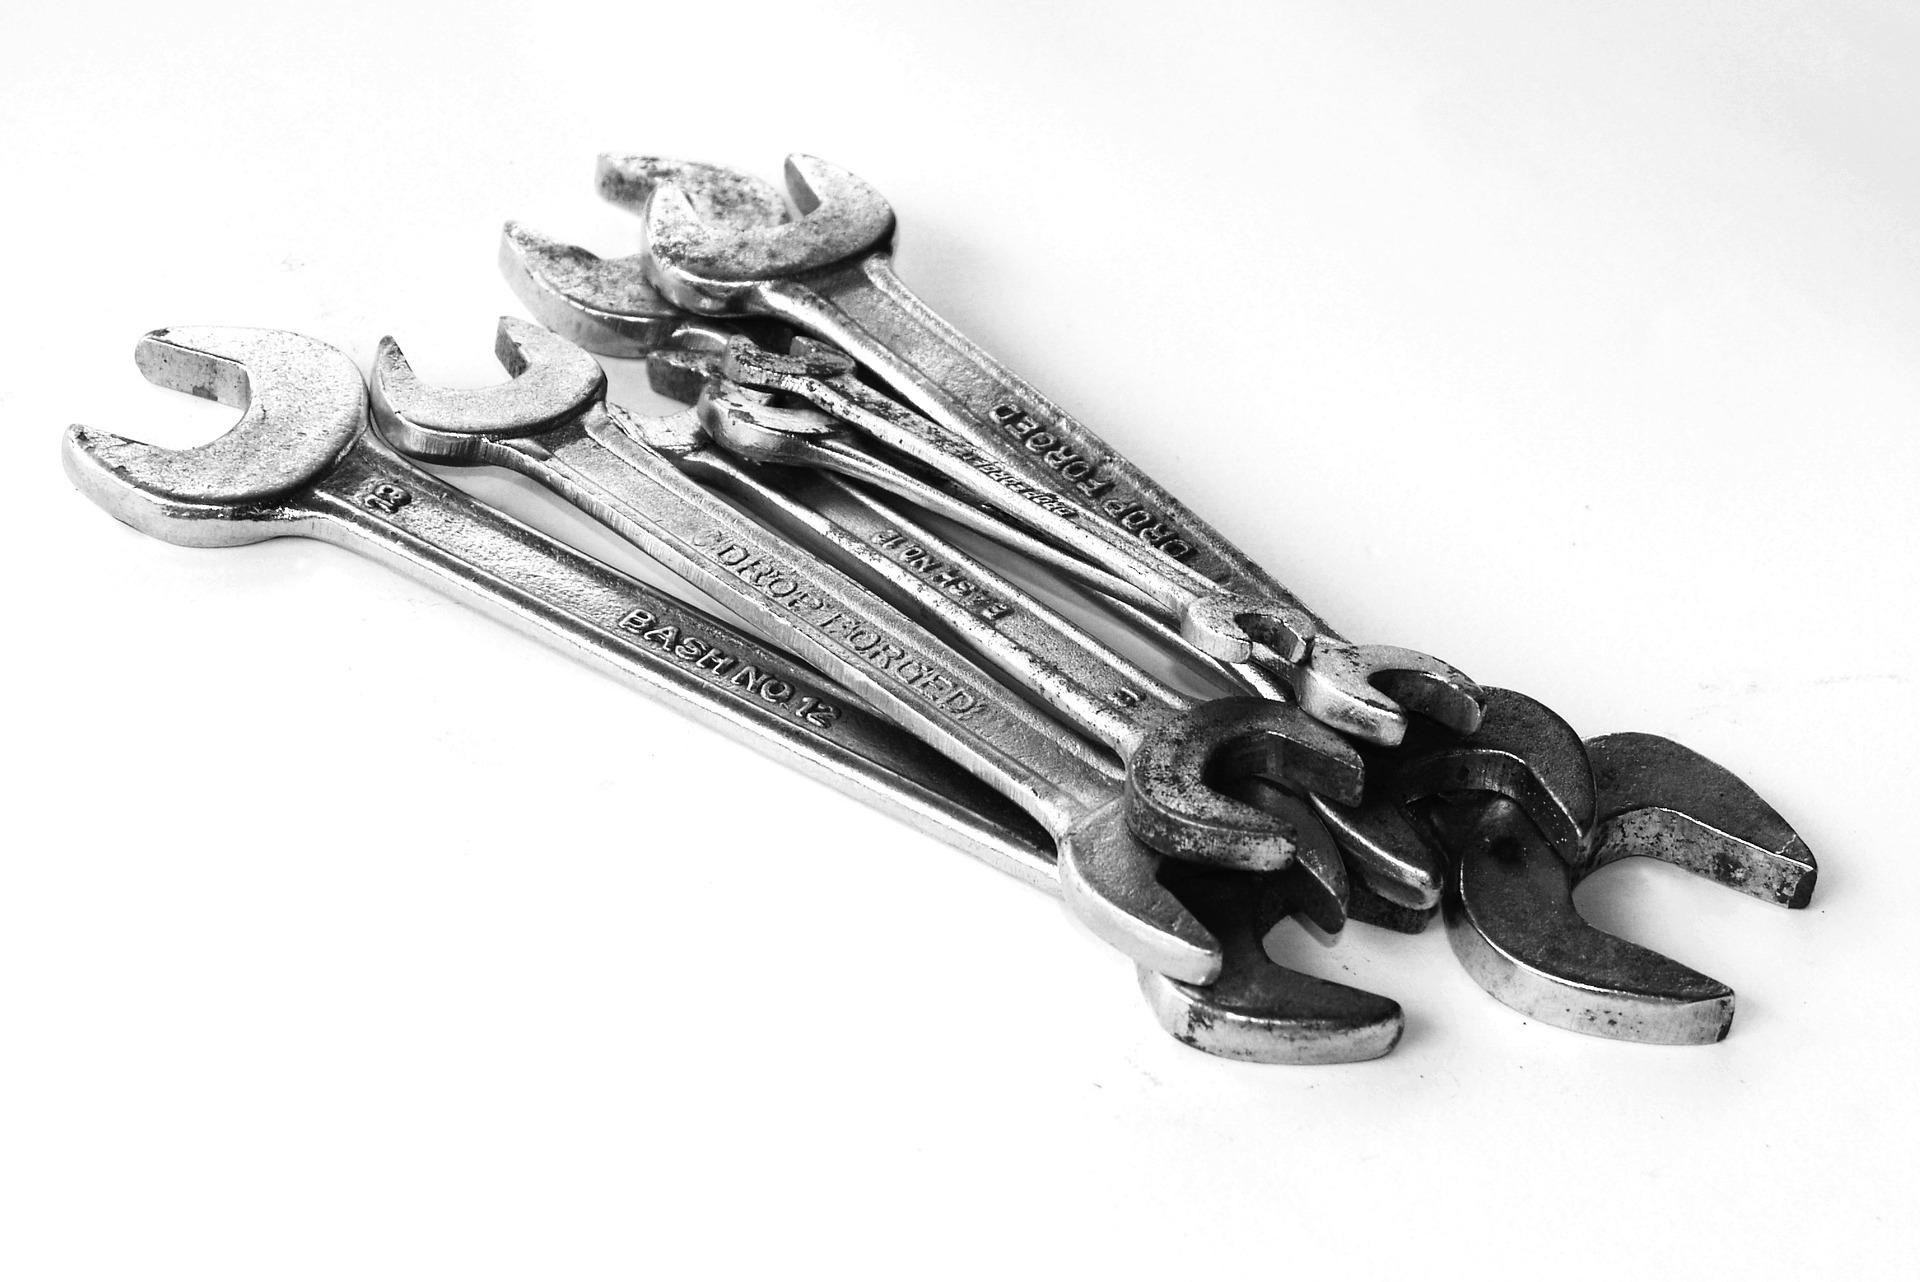 tools-1551451_1920.jpg